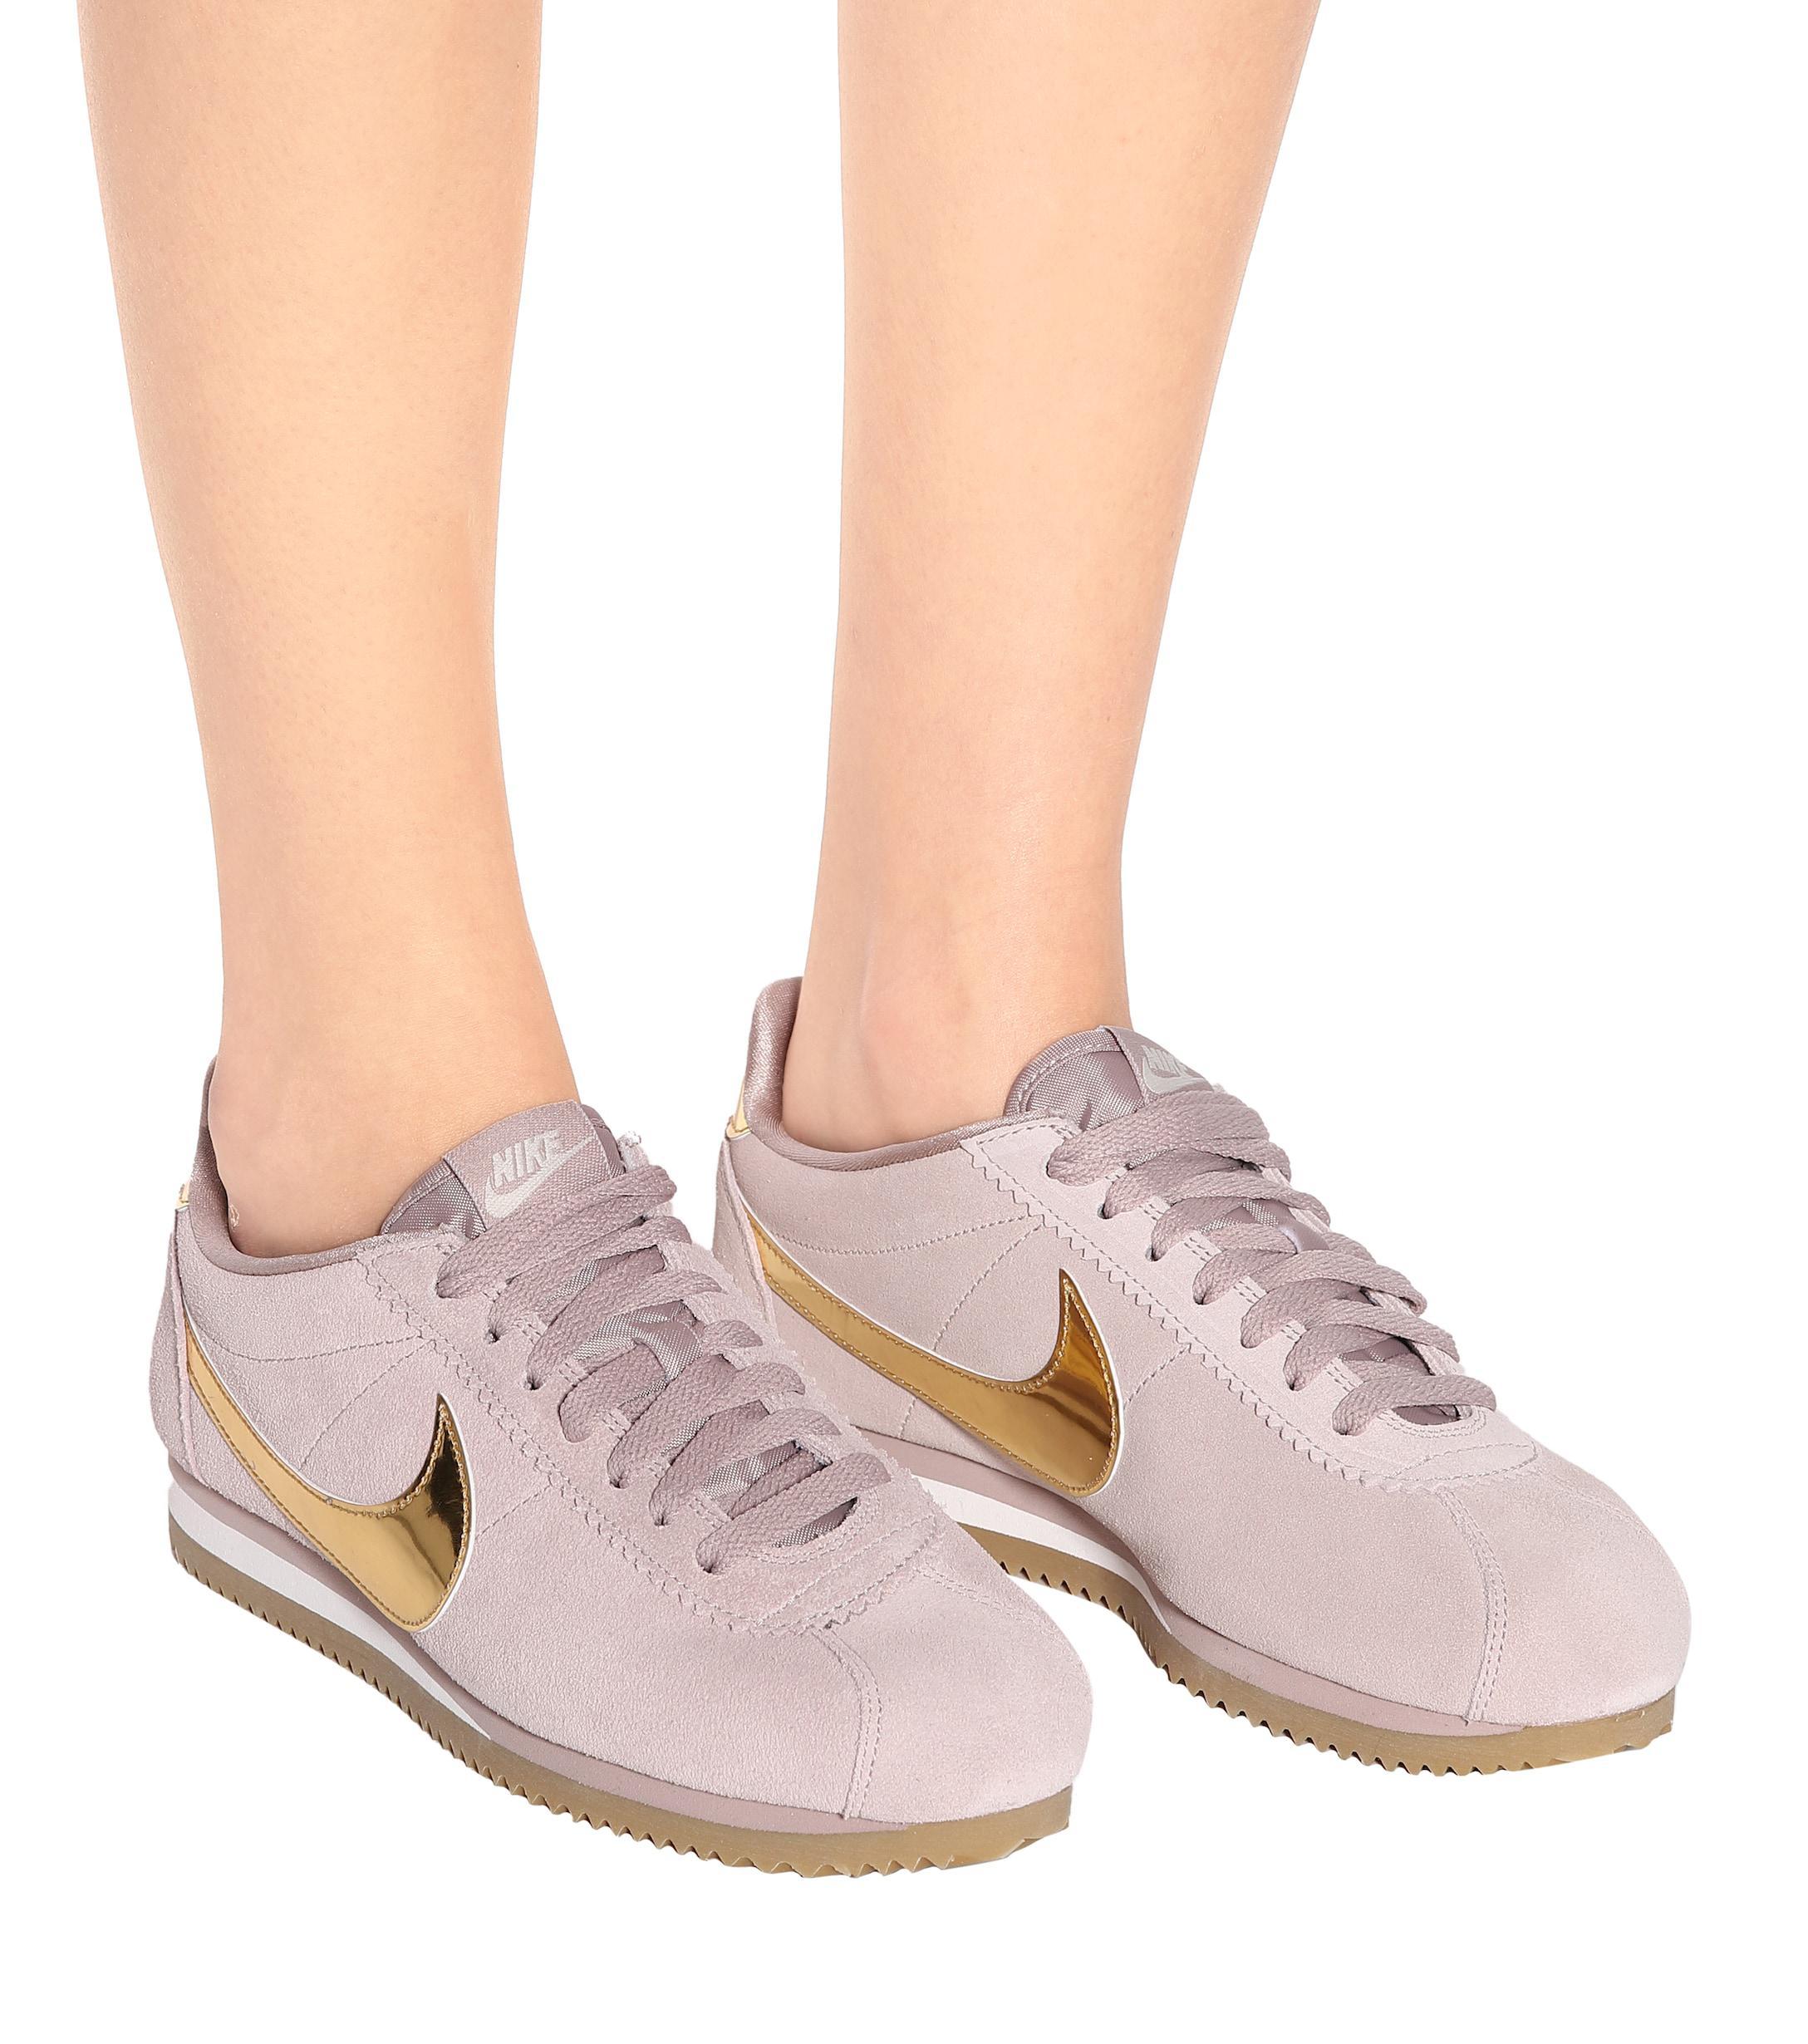 Zapatillas Classic Cortez Nike de color Rosa